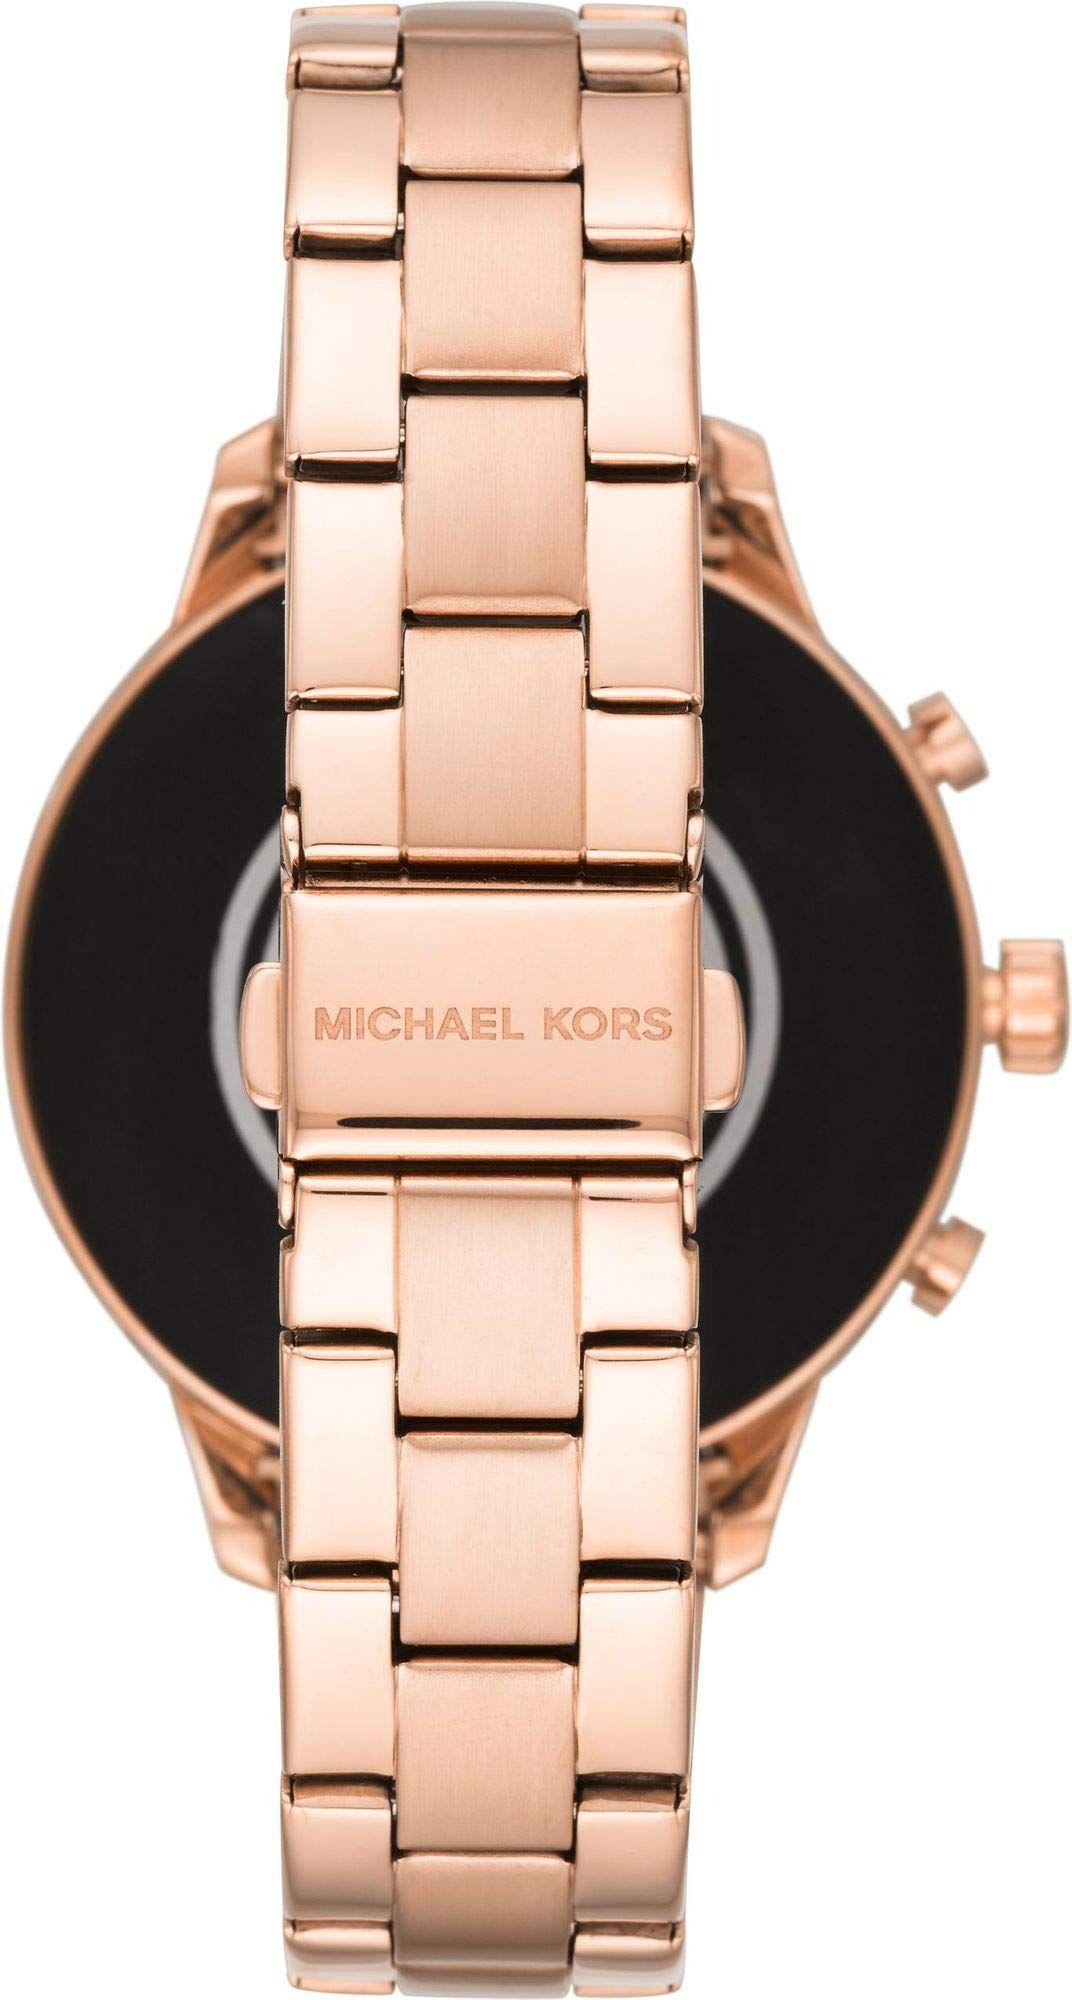 Michael Kors Damen Smartwatch Mit Edelstahl Armband Mkt5052